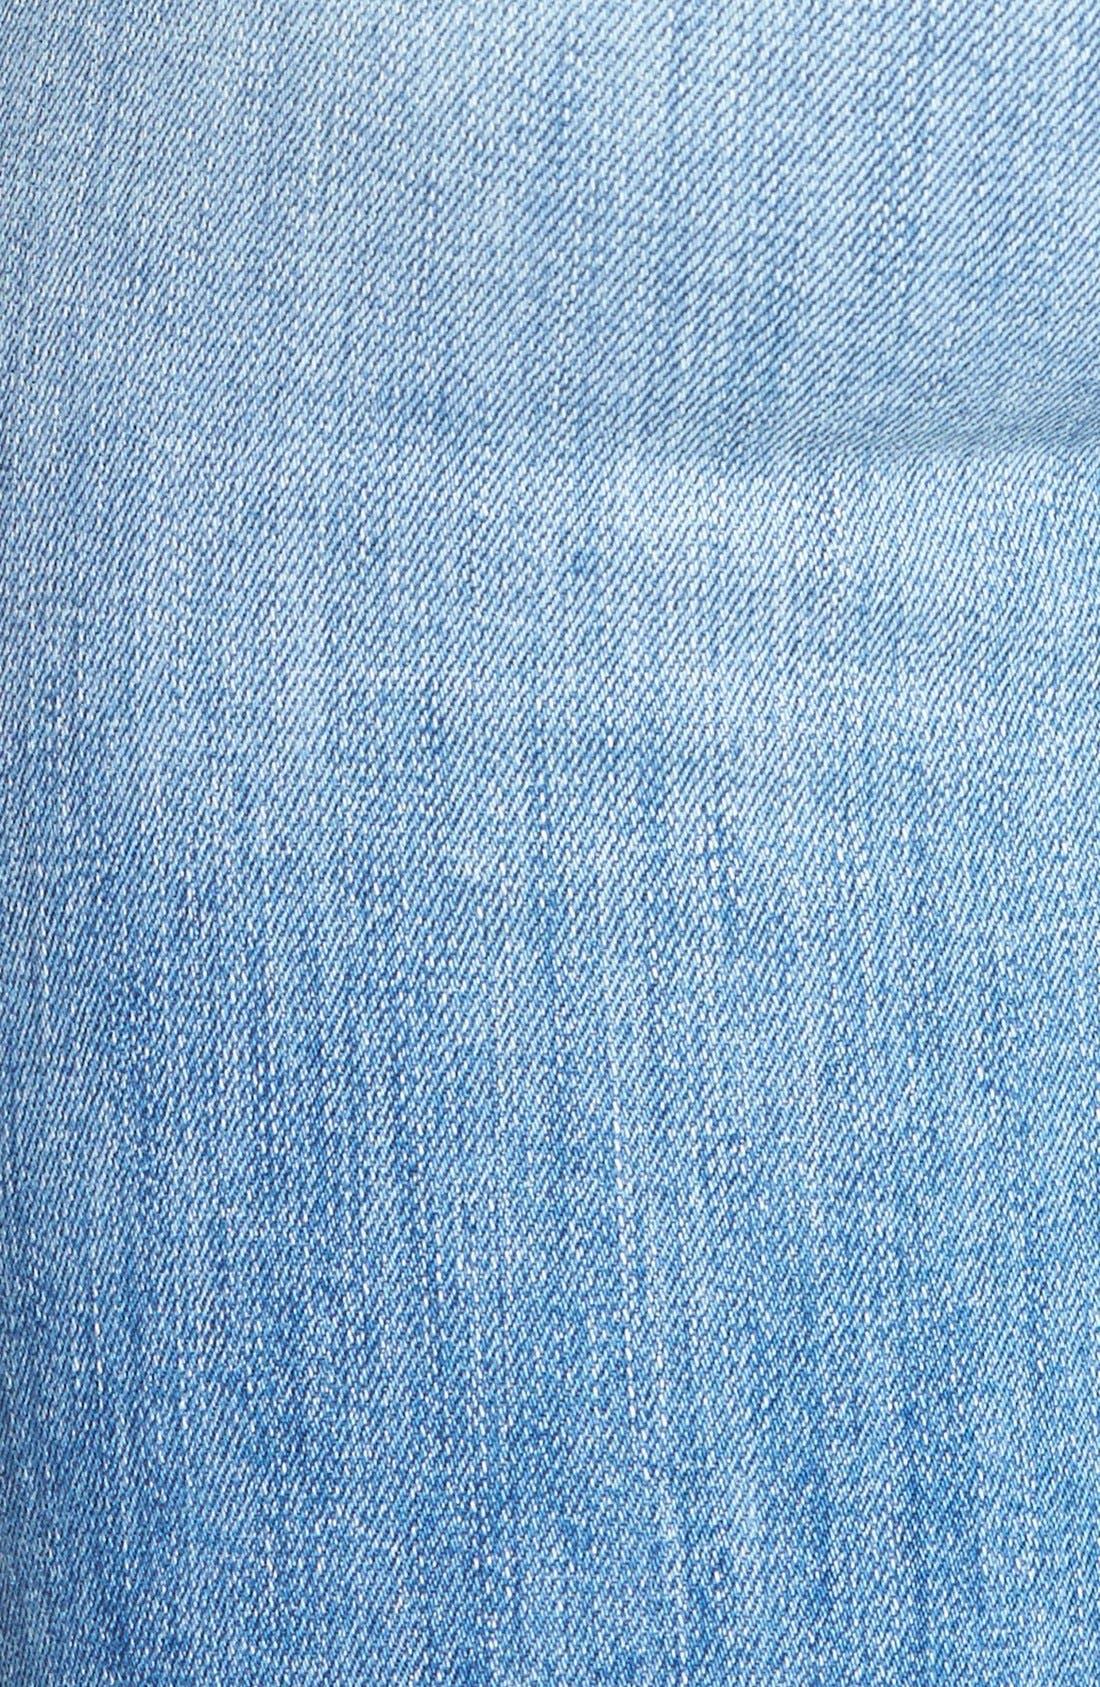 Alternate Image 3  - J Brand 'Martini' Flared Jeans (Eternal)